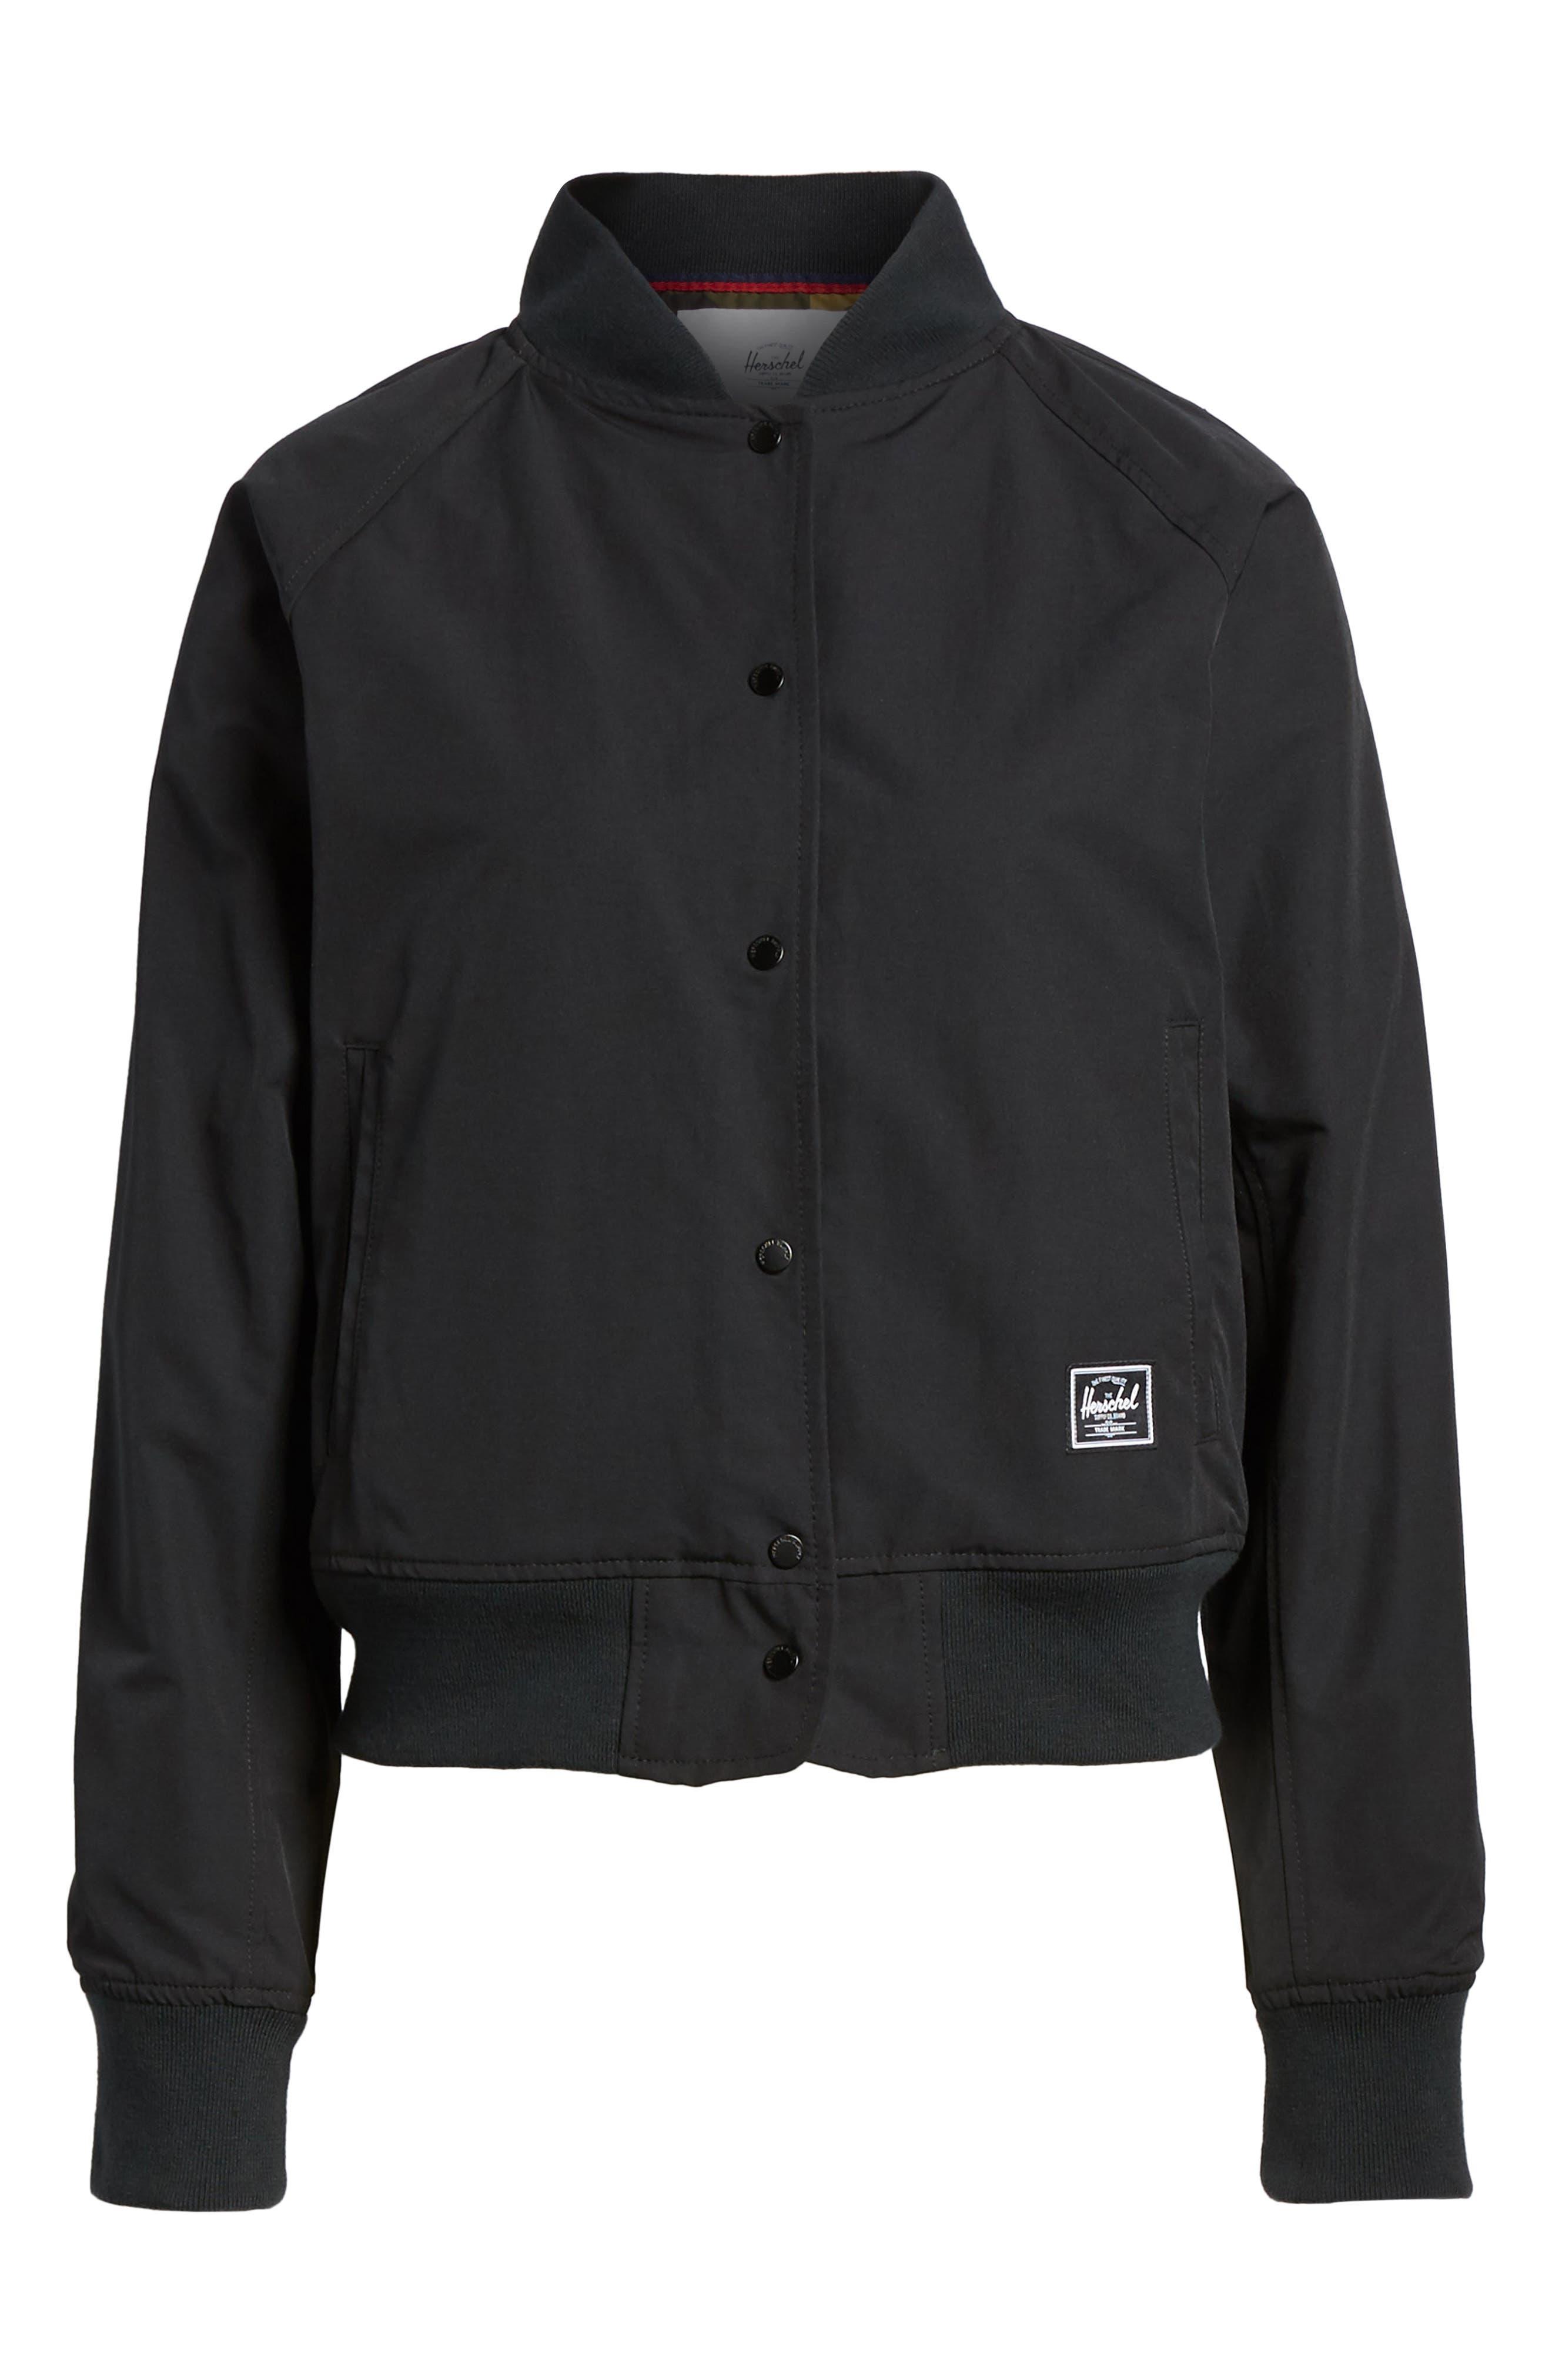 Varsity Jacket,                             Alternate thumbnail 7, color,                             Black/ Shadow